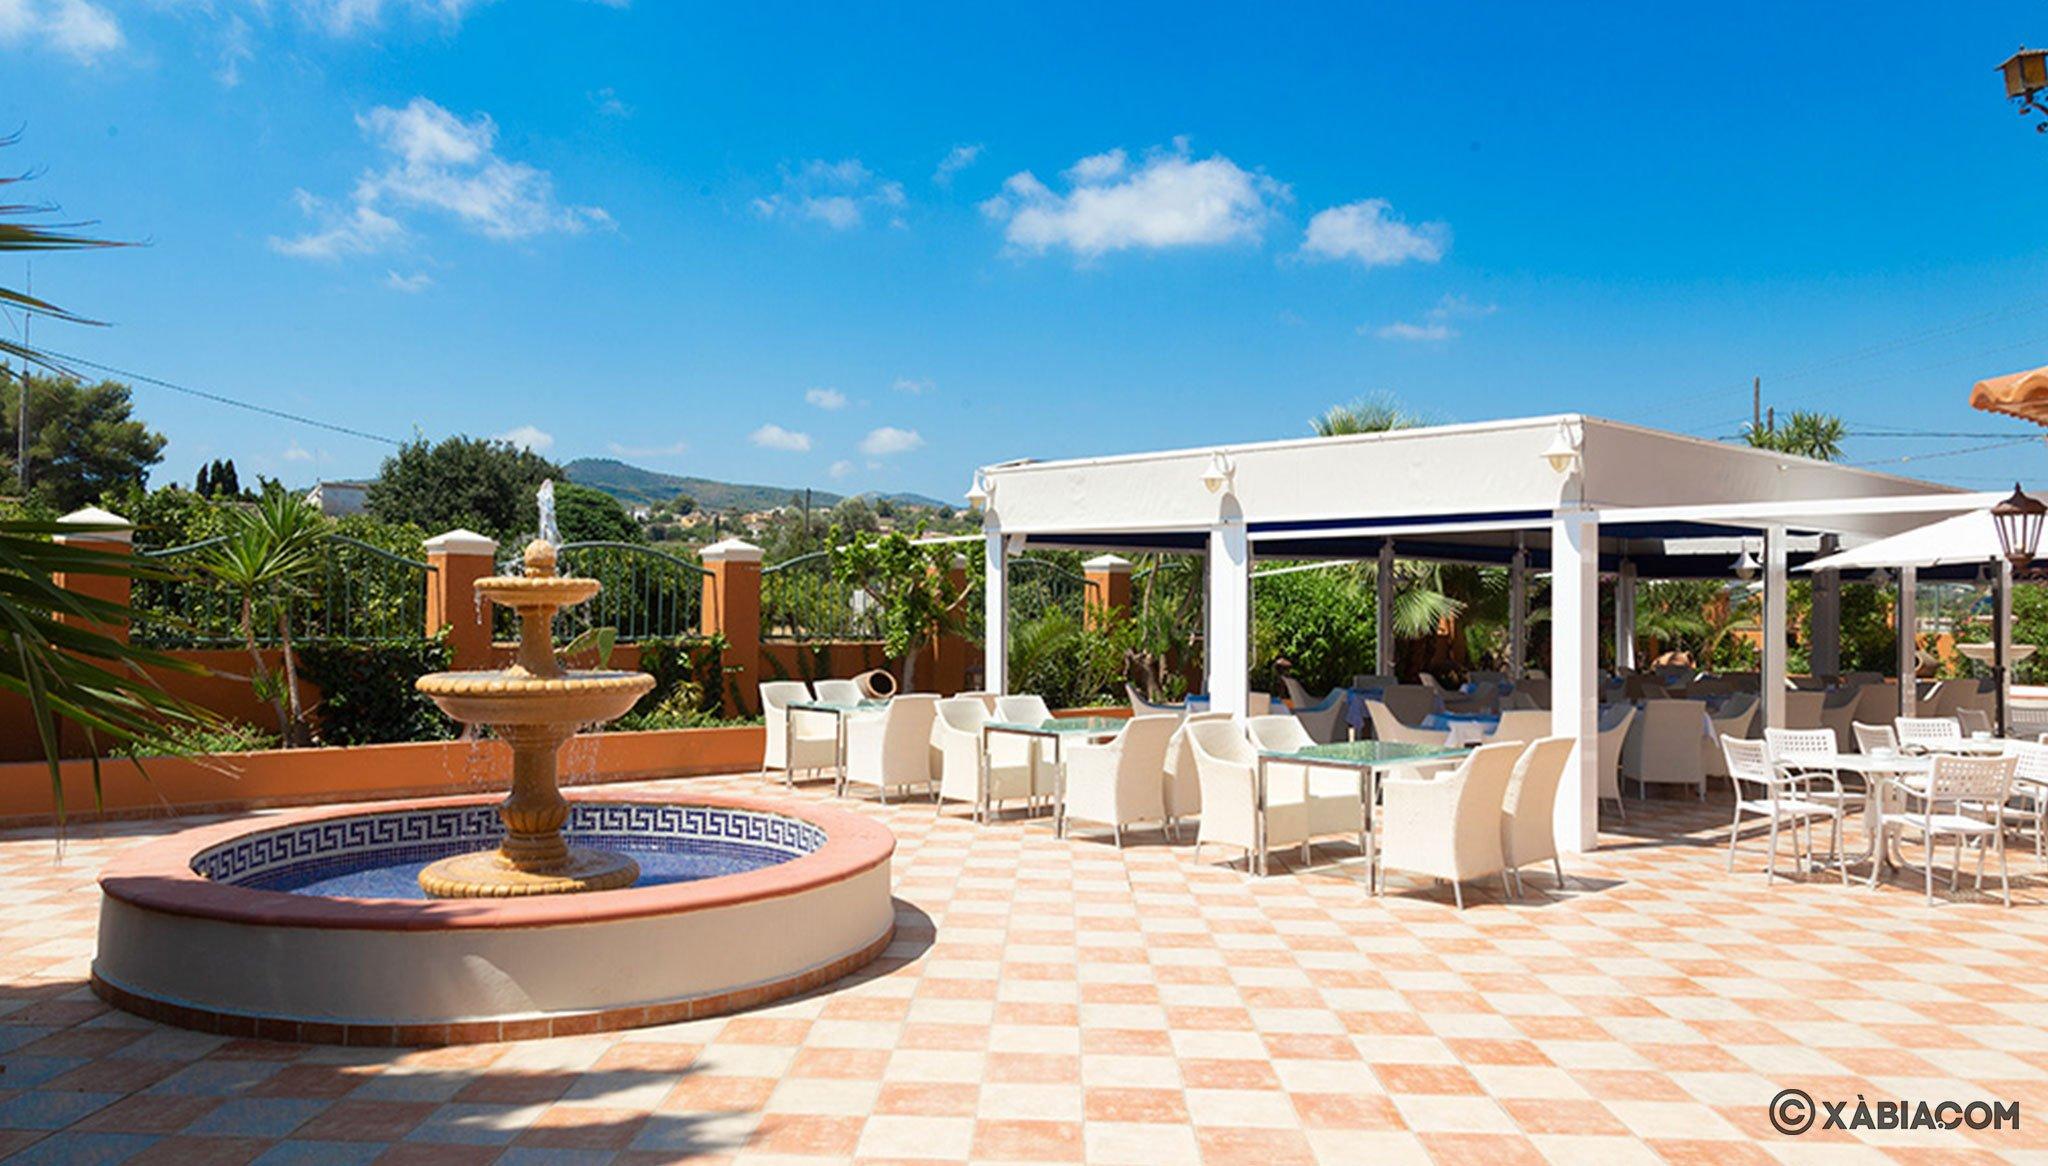 Terraza con vistas en Restaurante Canali